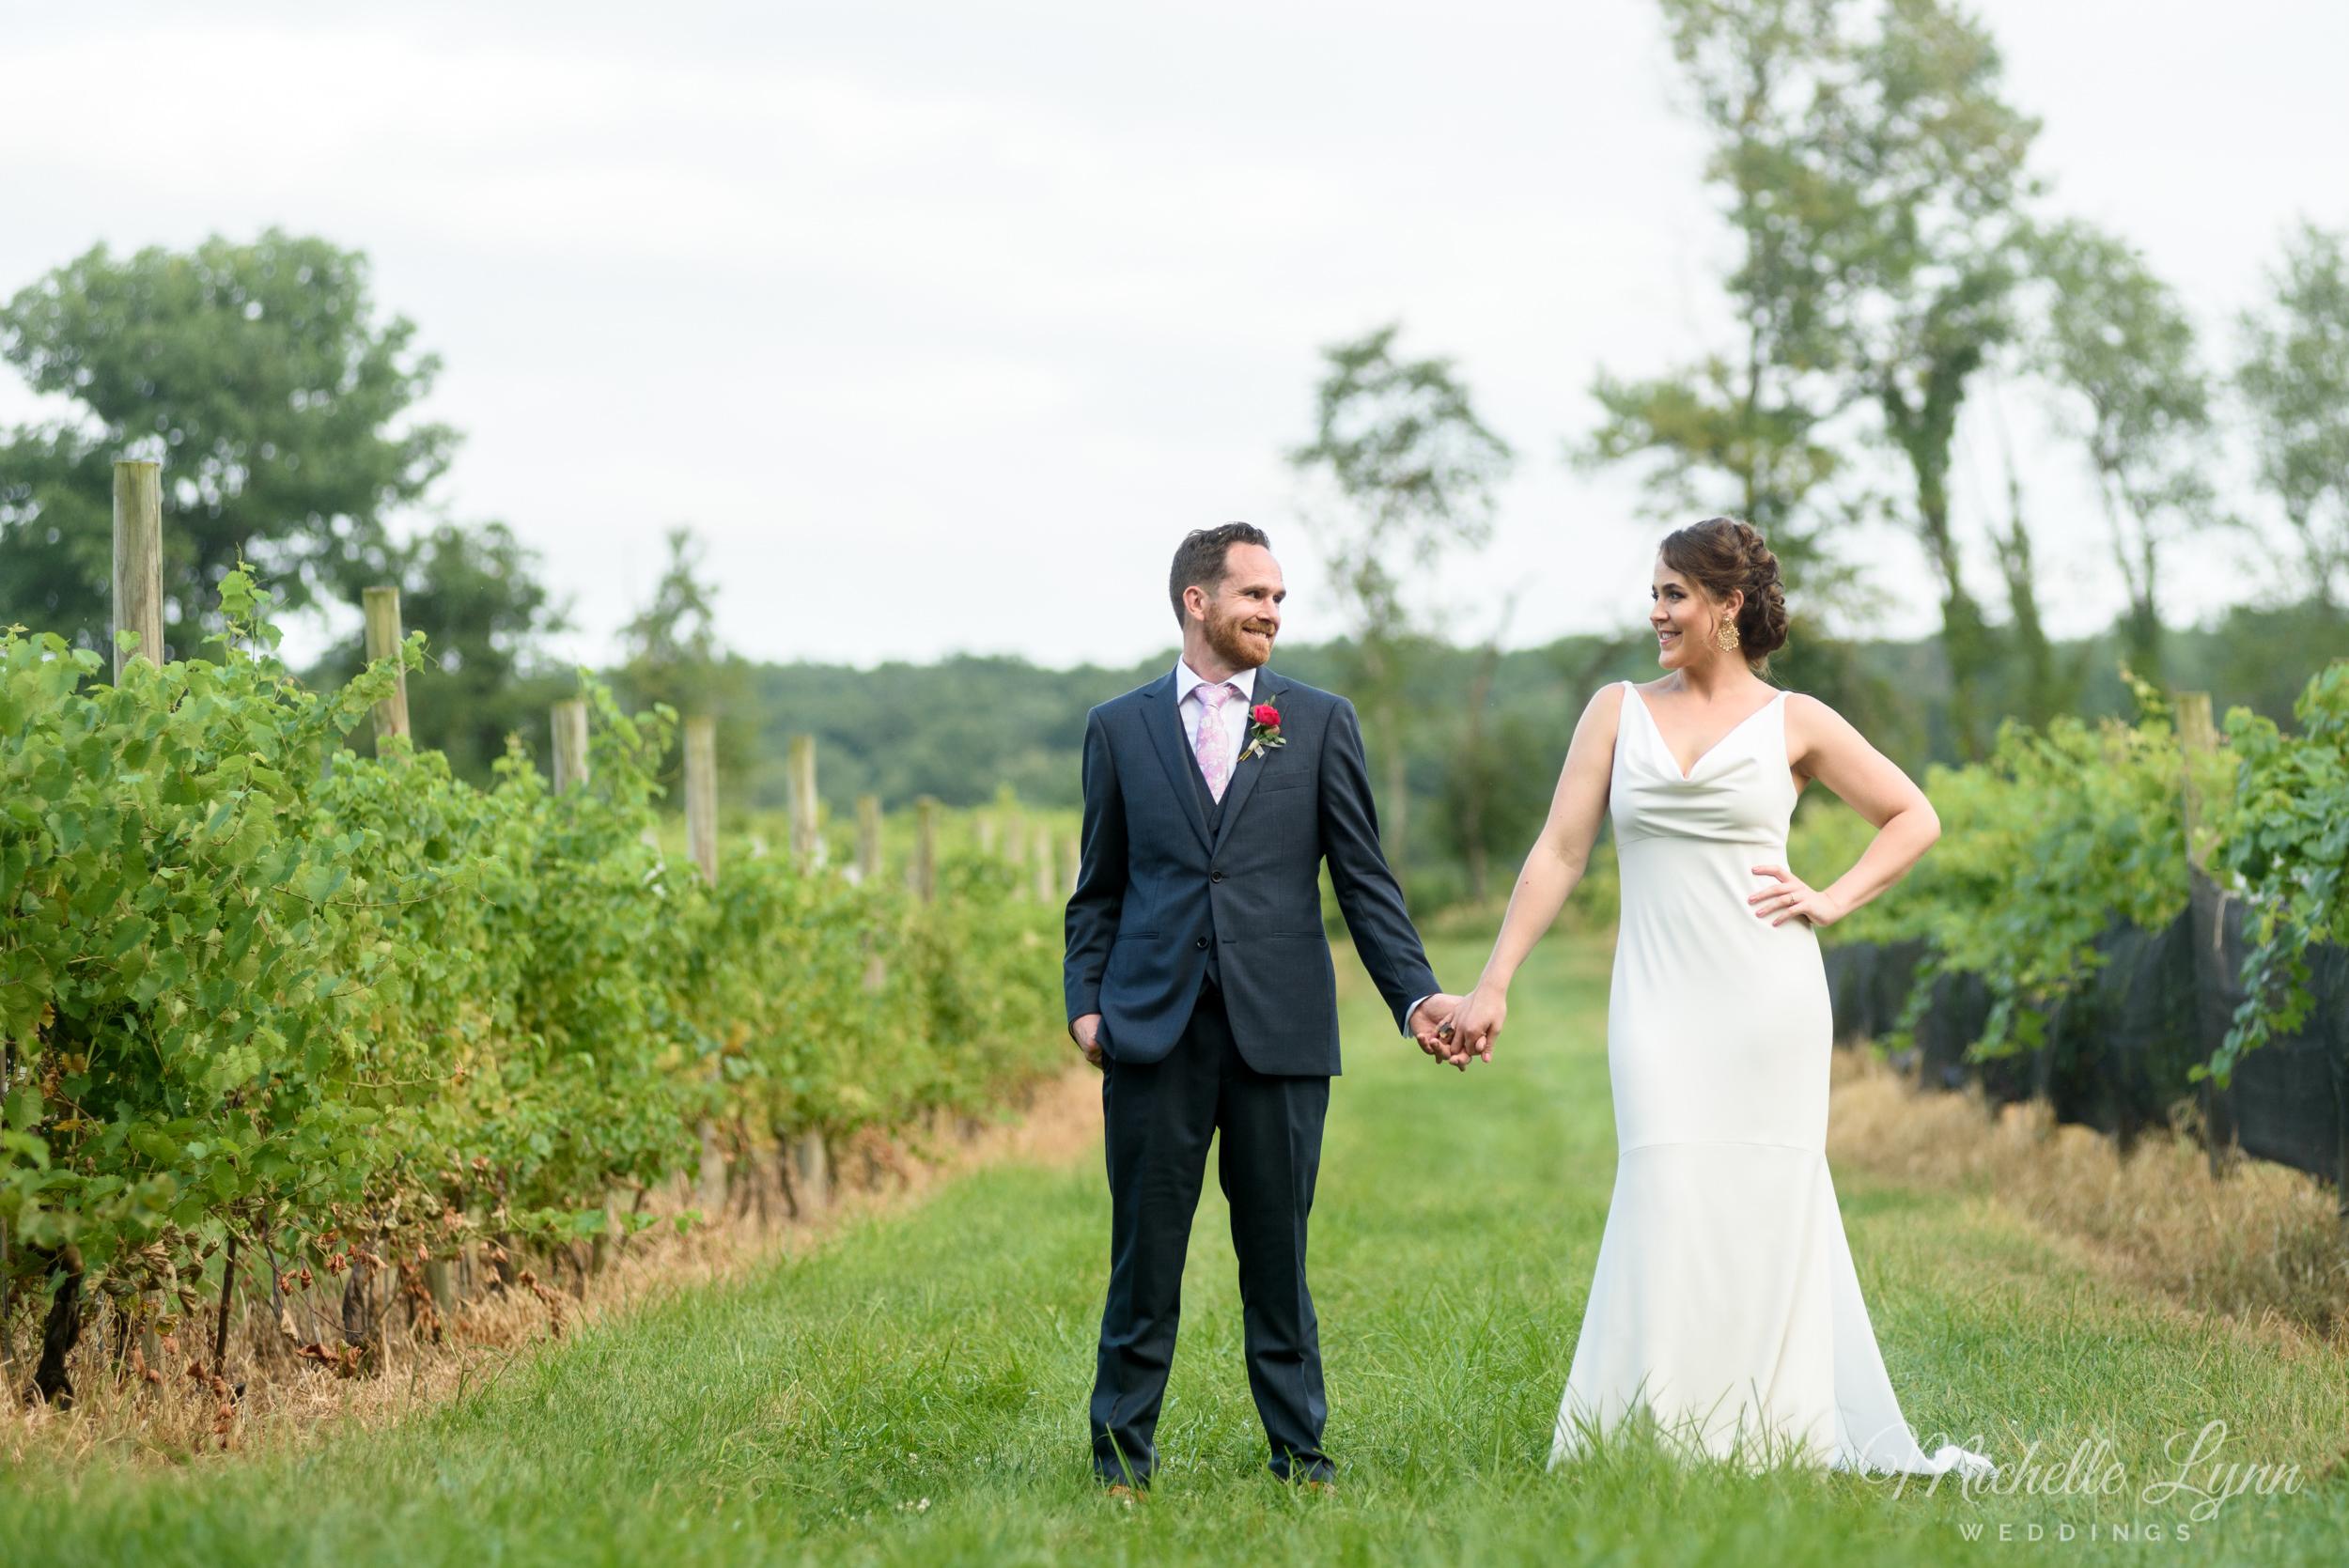 mlw-unionville-vineyards-nj-wedding-photography-66.jpg